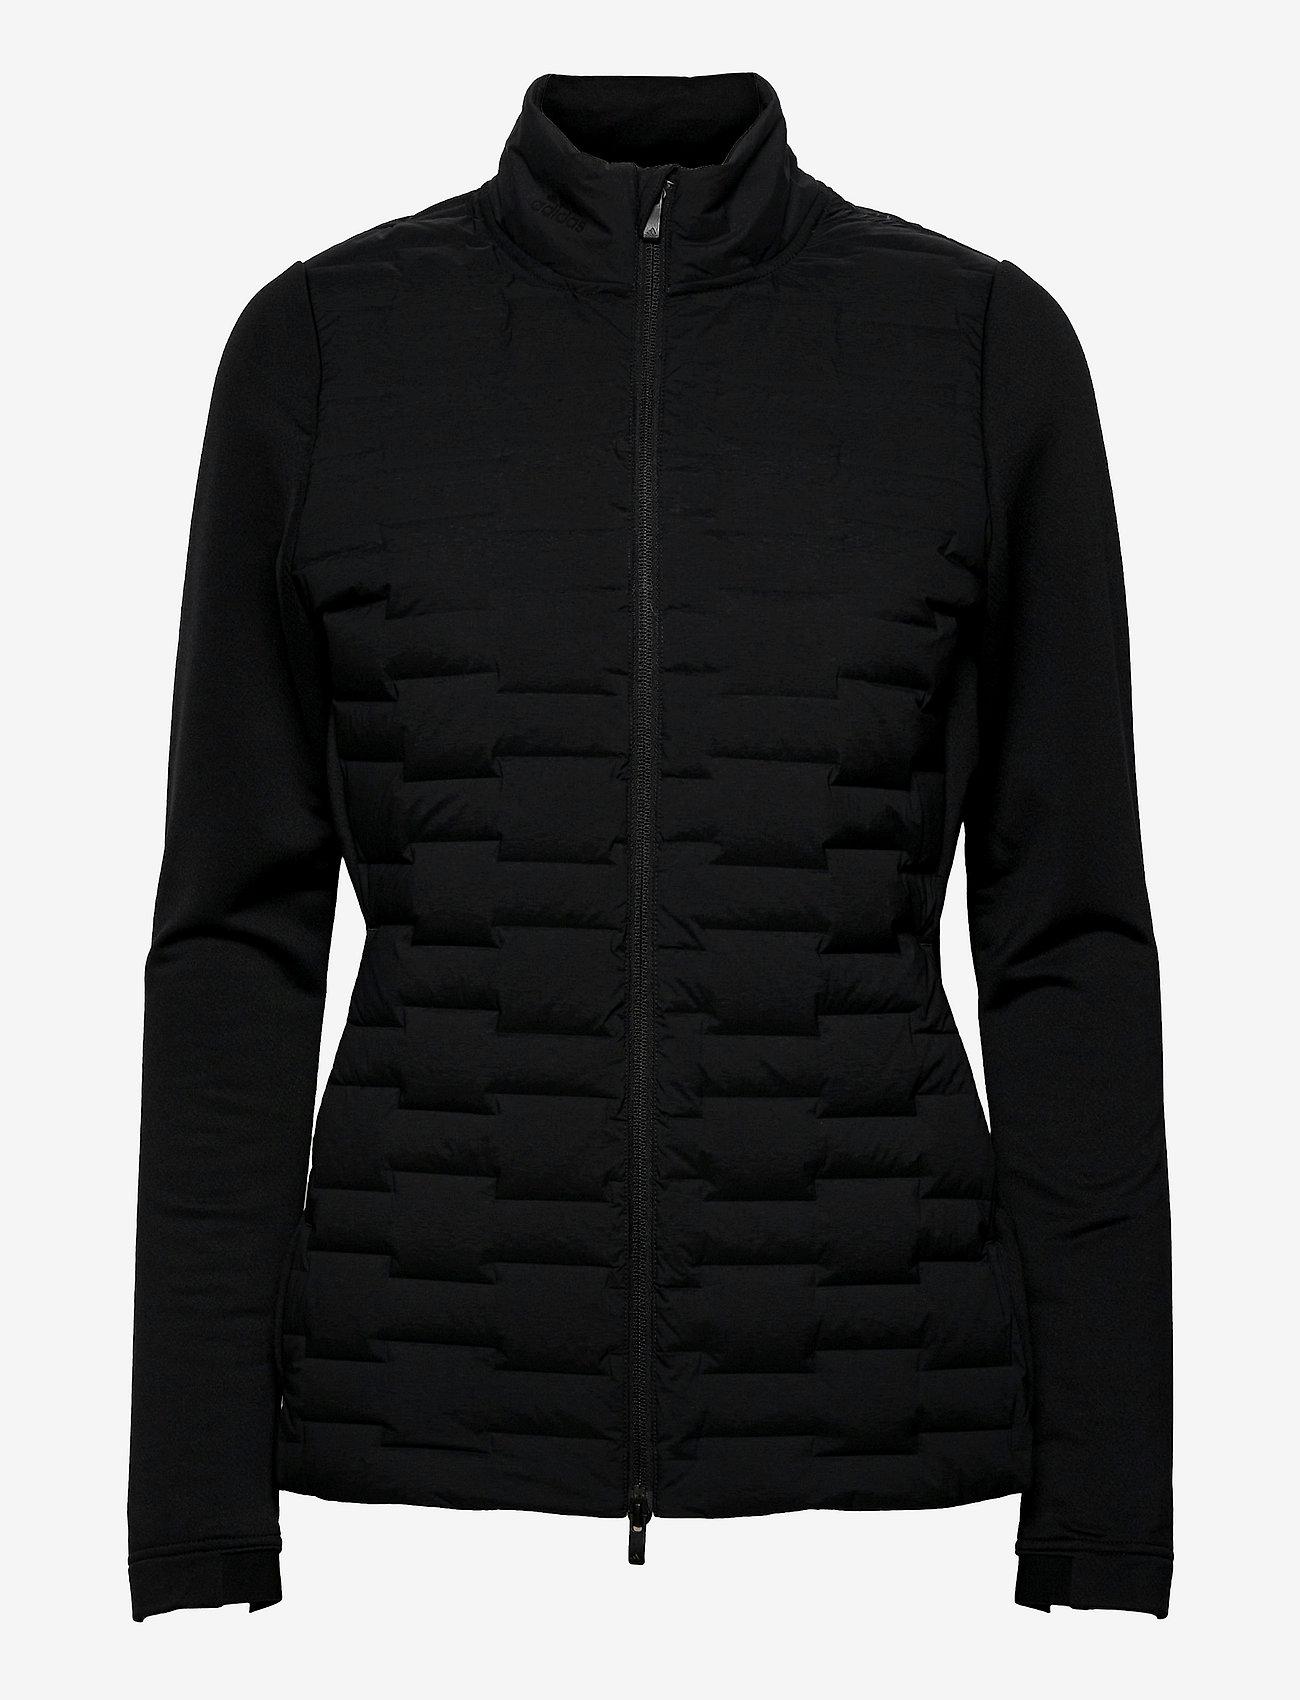 adidas Golf - FRSTGD JKT - vestes de golf - black - 0